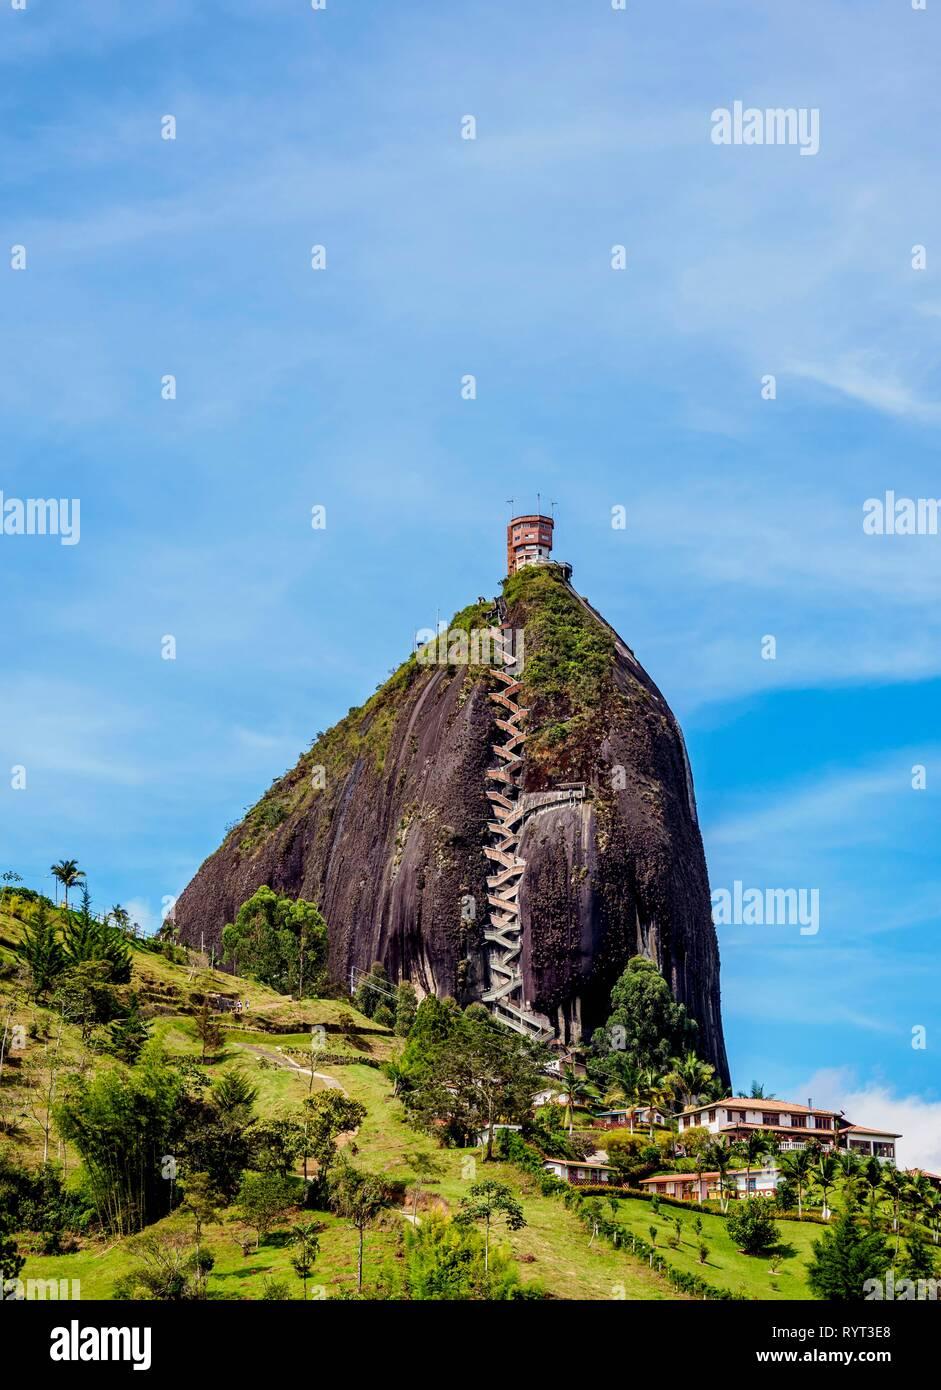 el-penon-de-guatape-rock-of-guatape-antioquia-department-colombia-RYT3E8.jpg